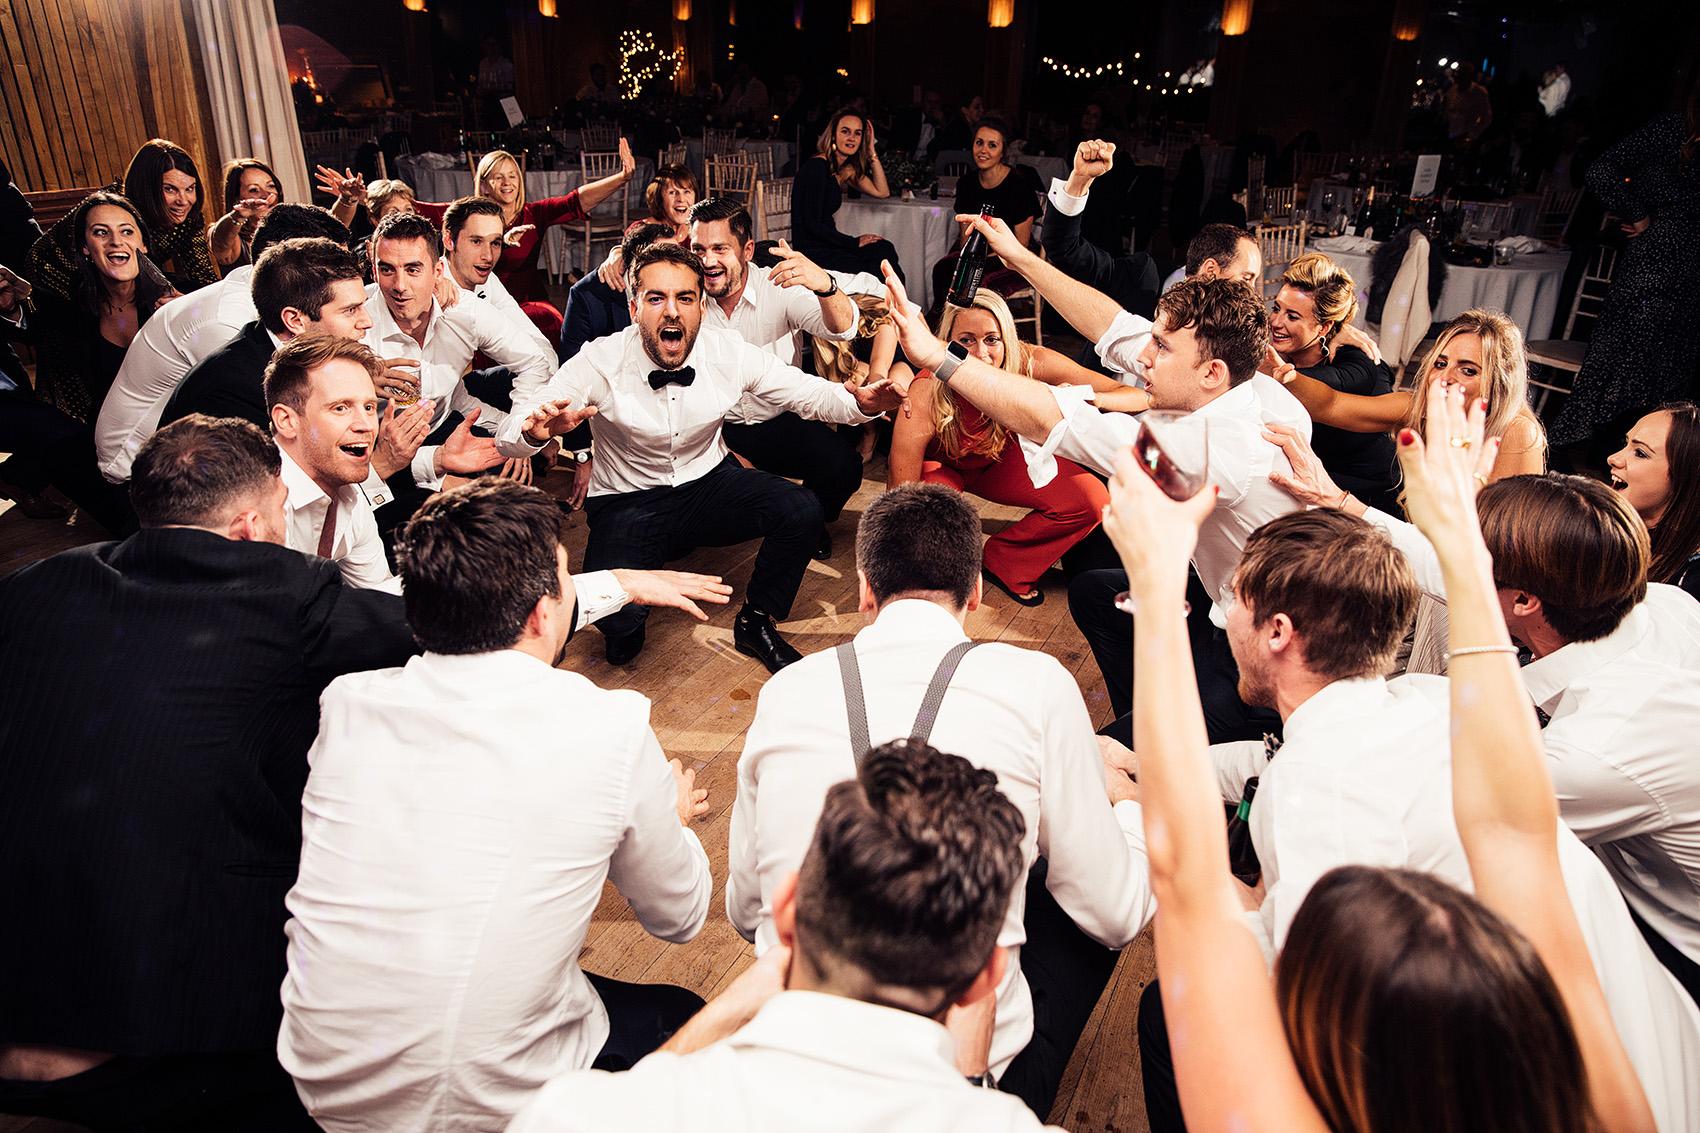 elmore-court-wedding-photography-93.jpg